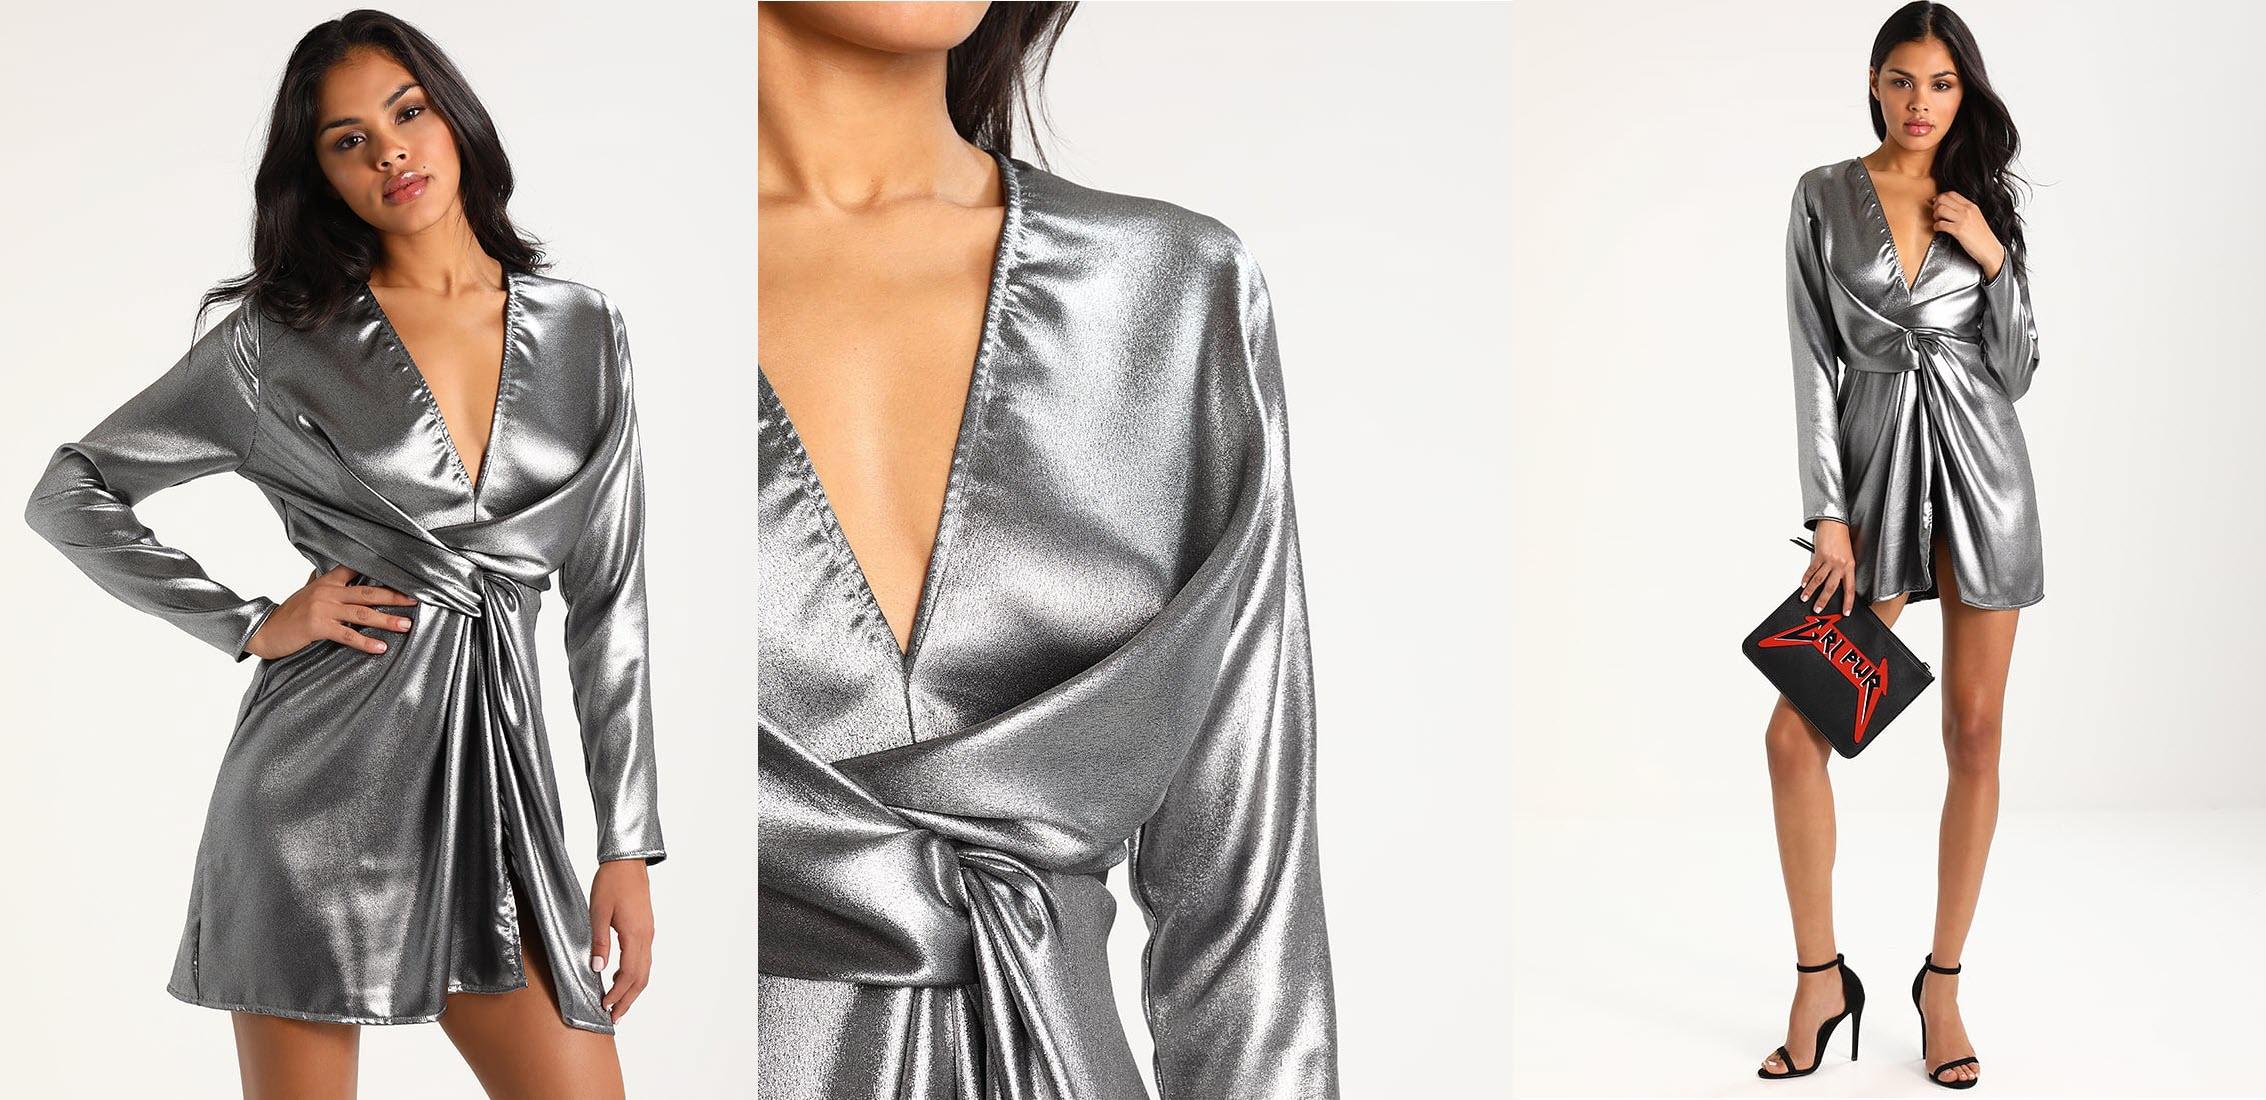 srebrna krótka sukienka sylwestrowa